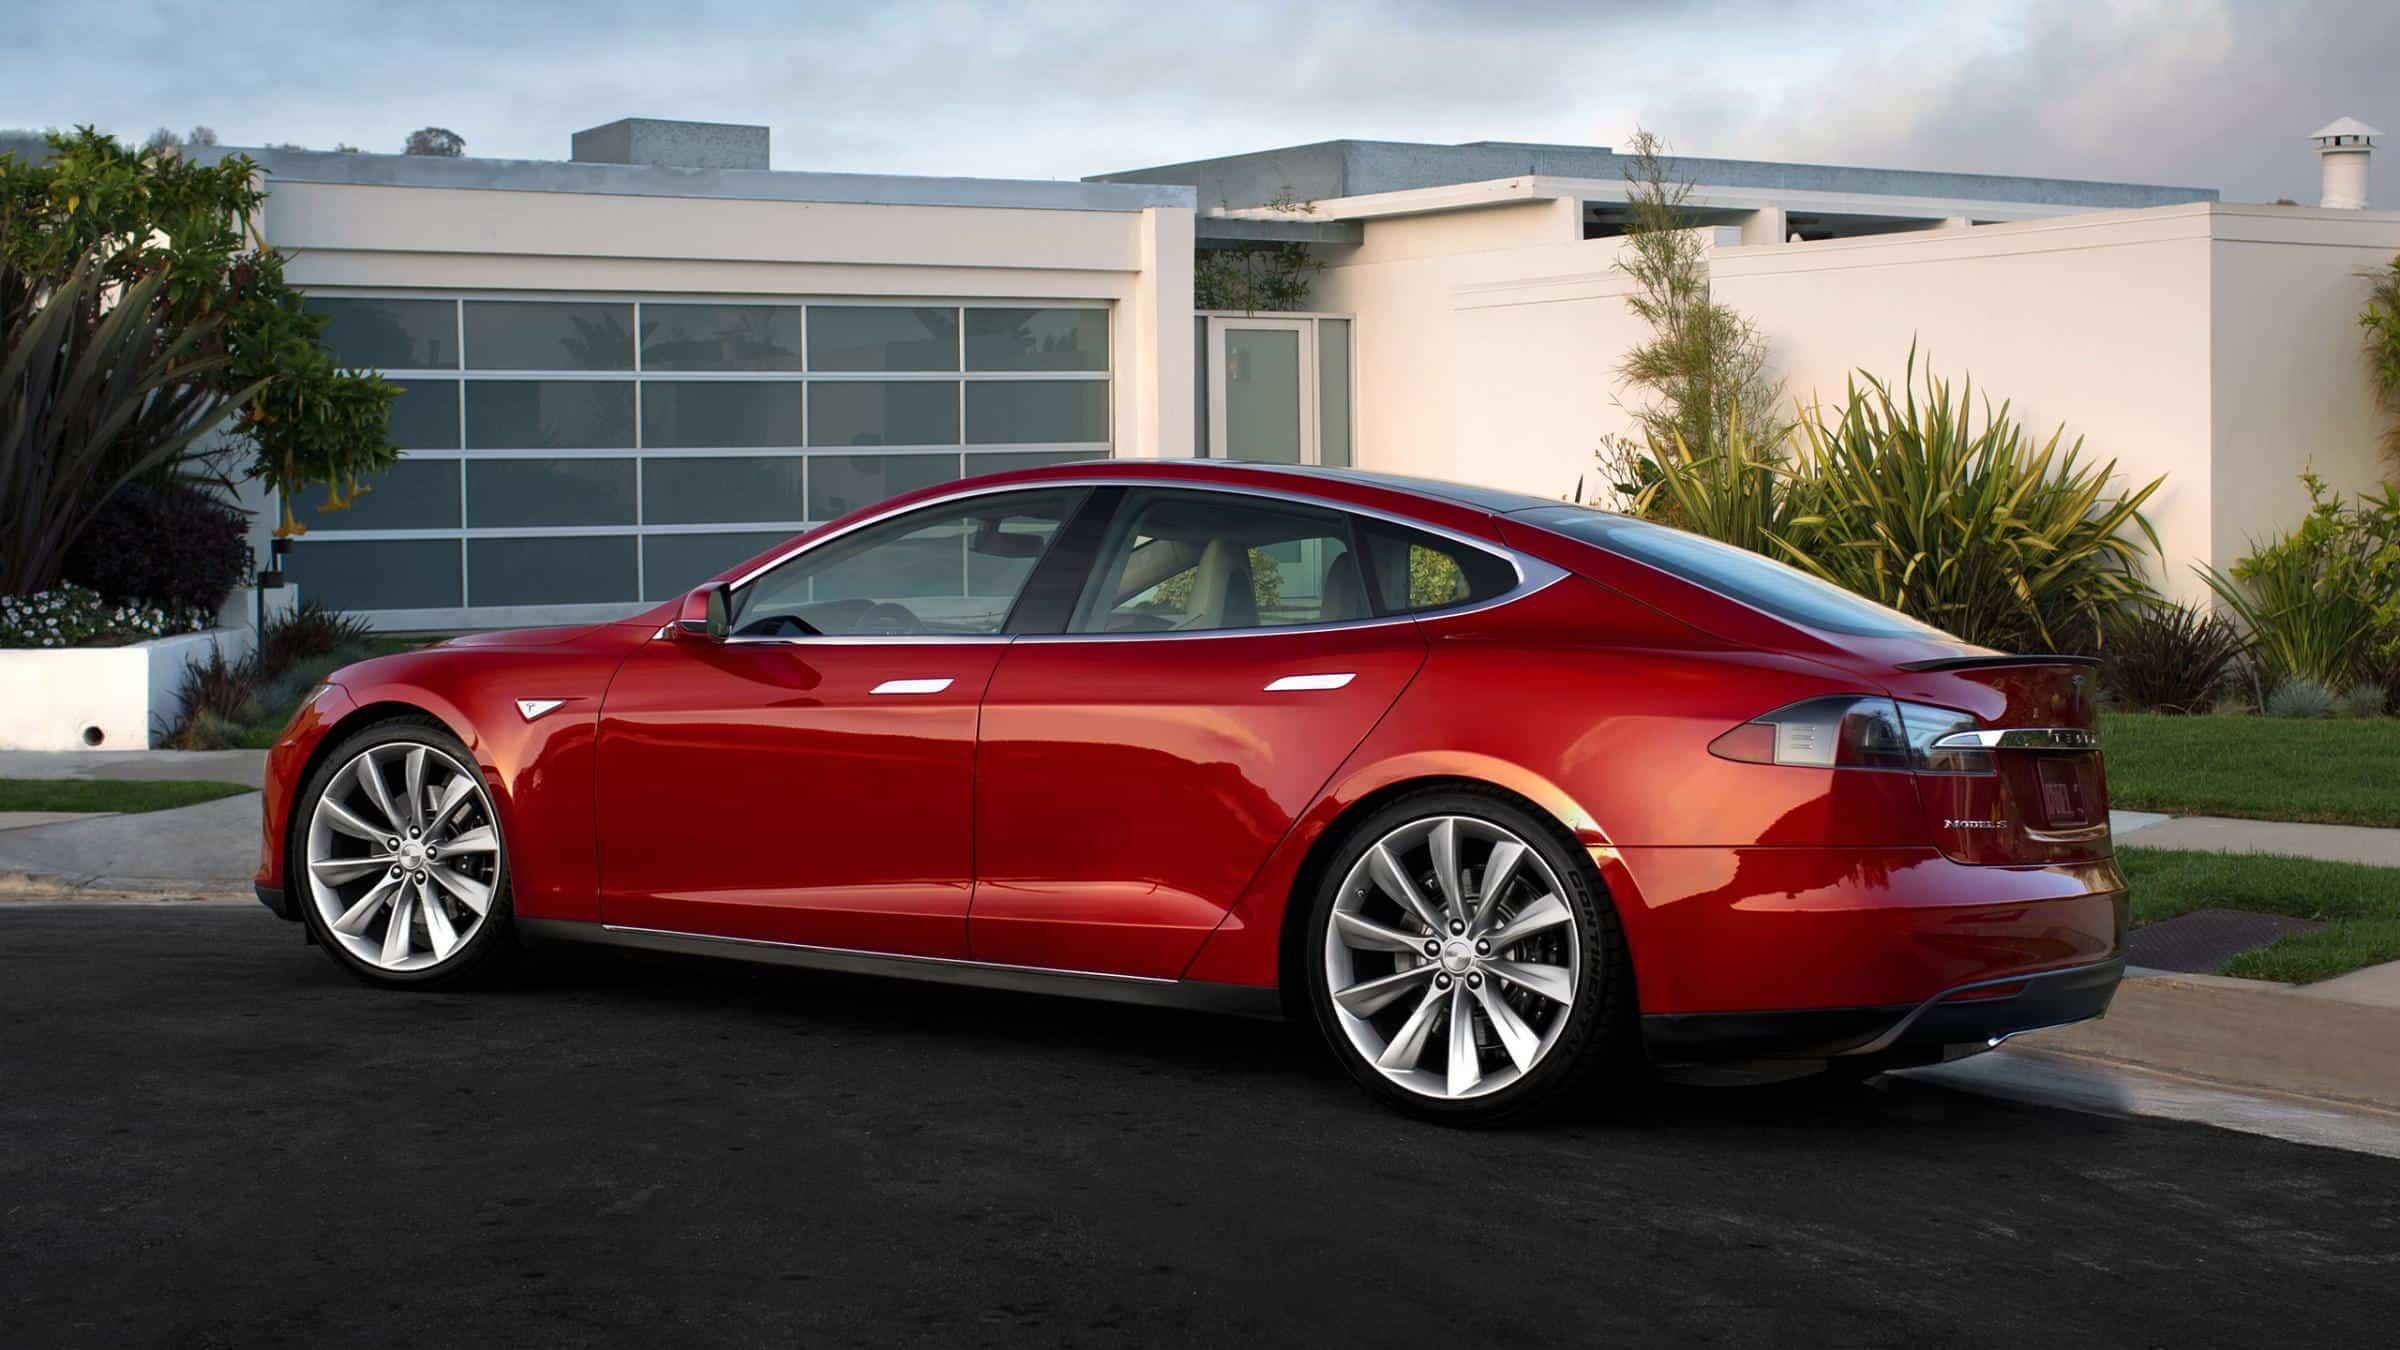 Tesla-Model-S-Red-inside-Picture